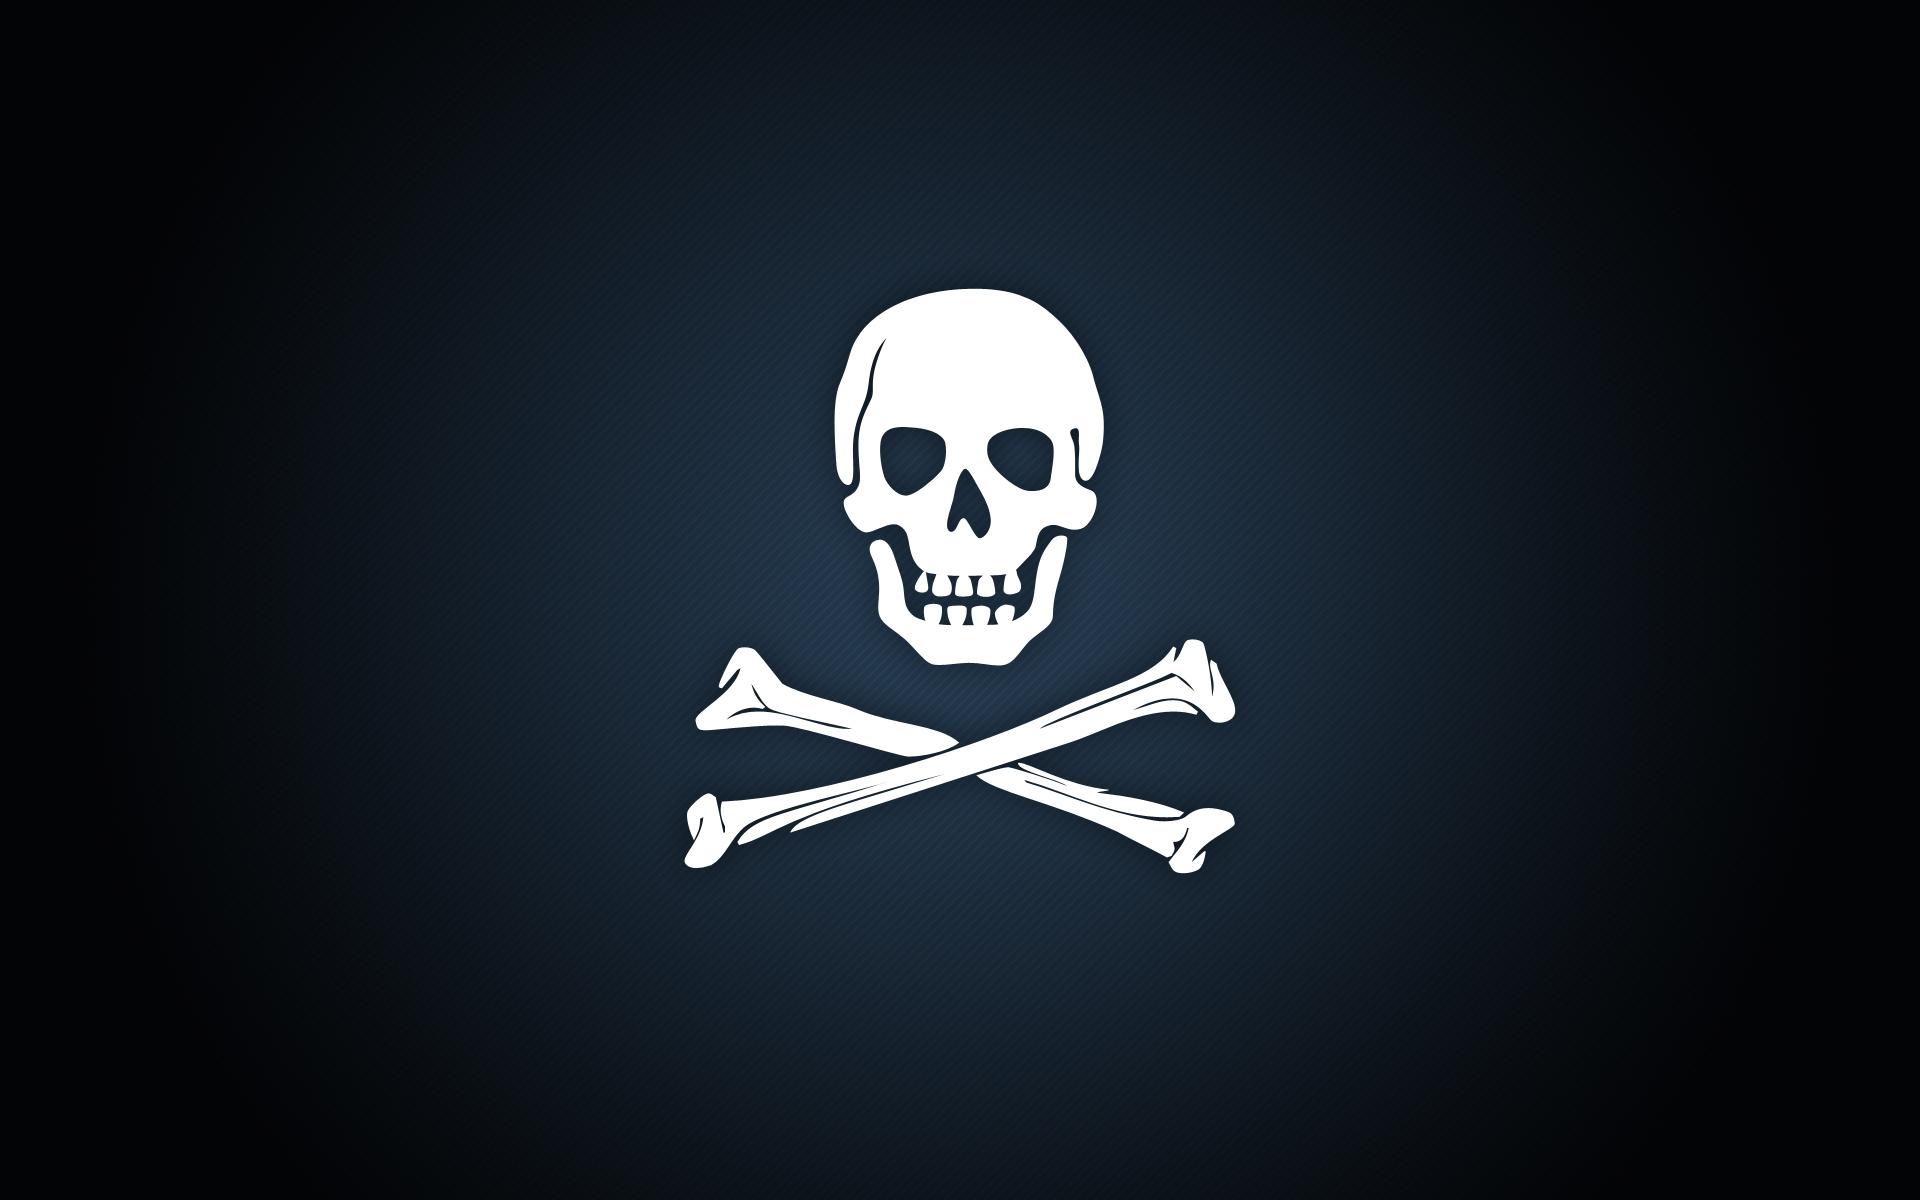 Pirate Flag Skull Wallpaper | High Quality Wallpapers,Wallpaper ...